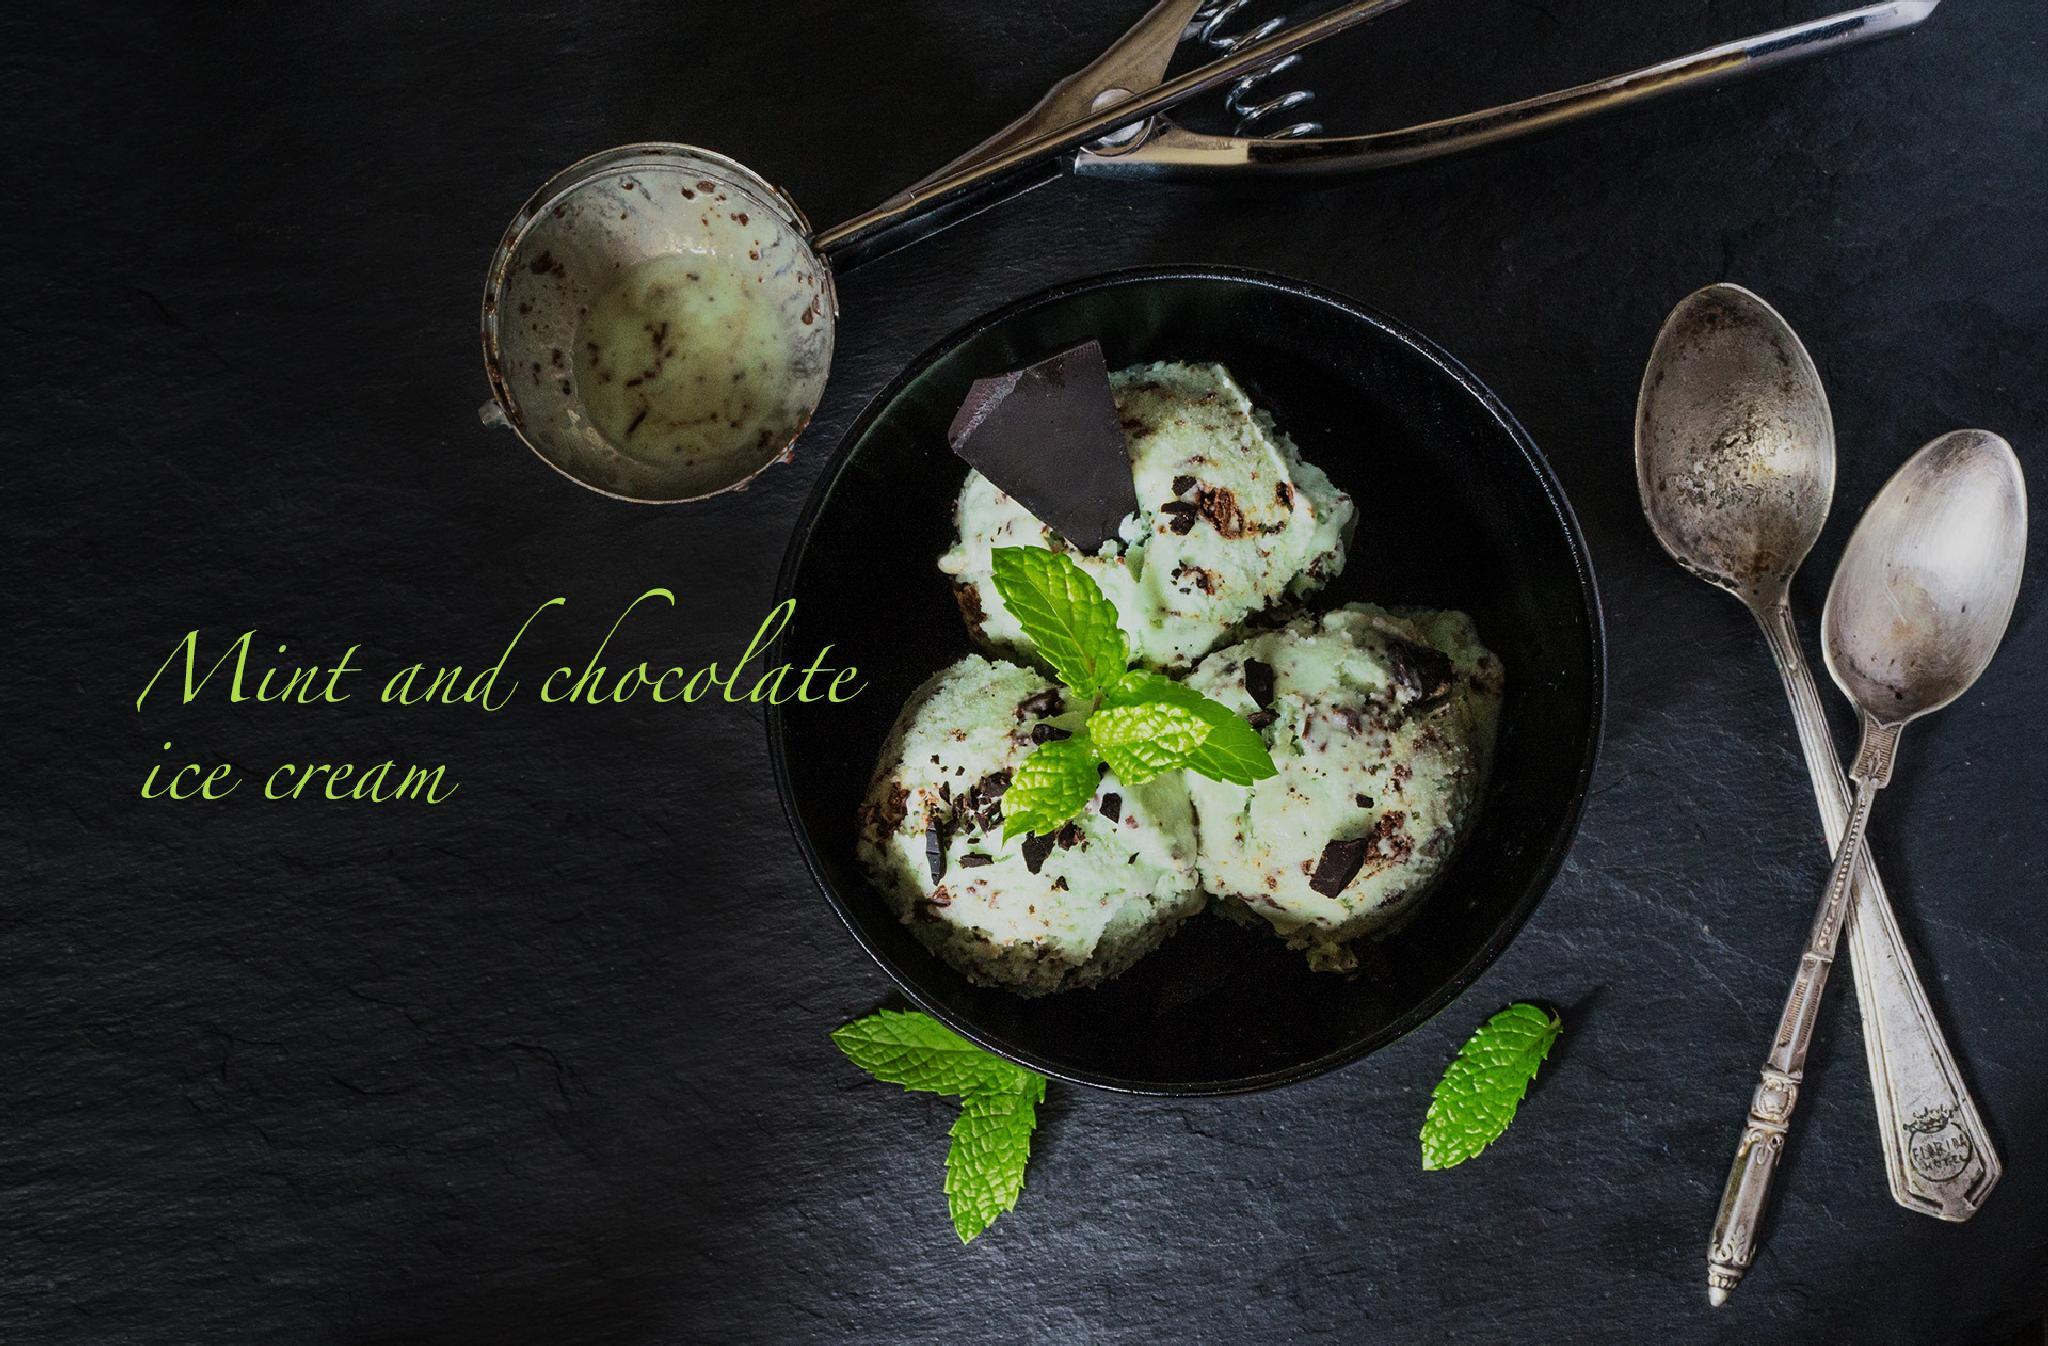 Mint and chocolate ice cream by Ana Gomez